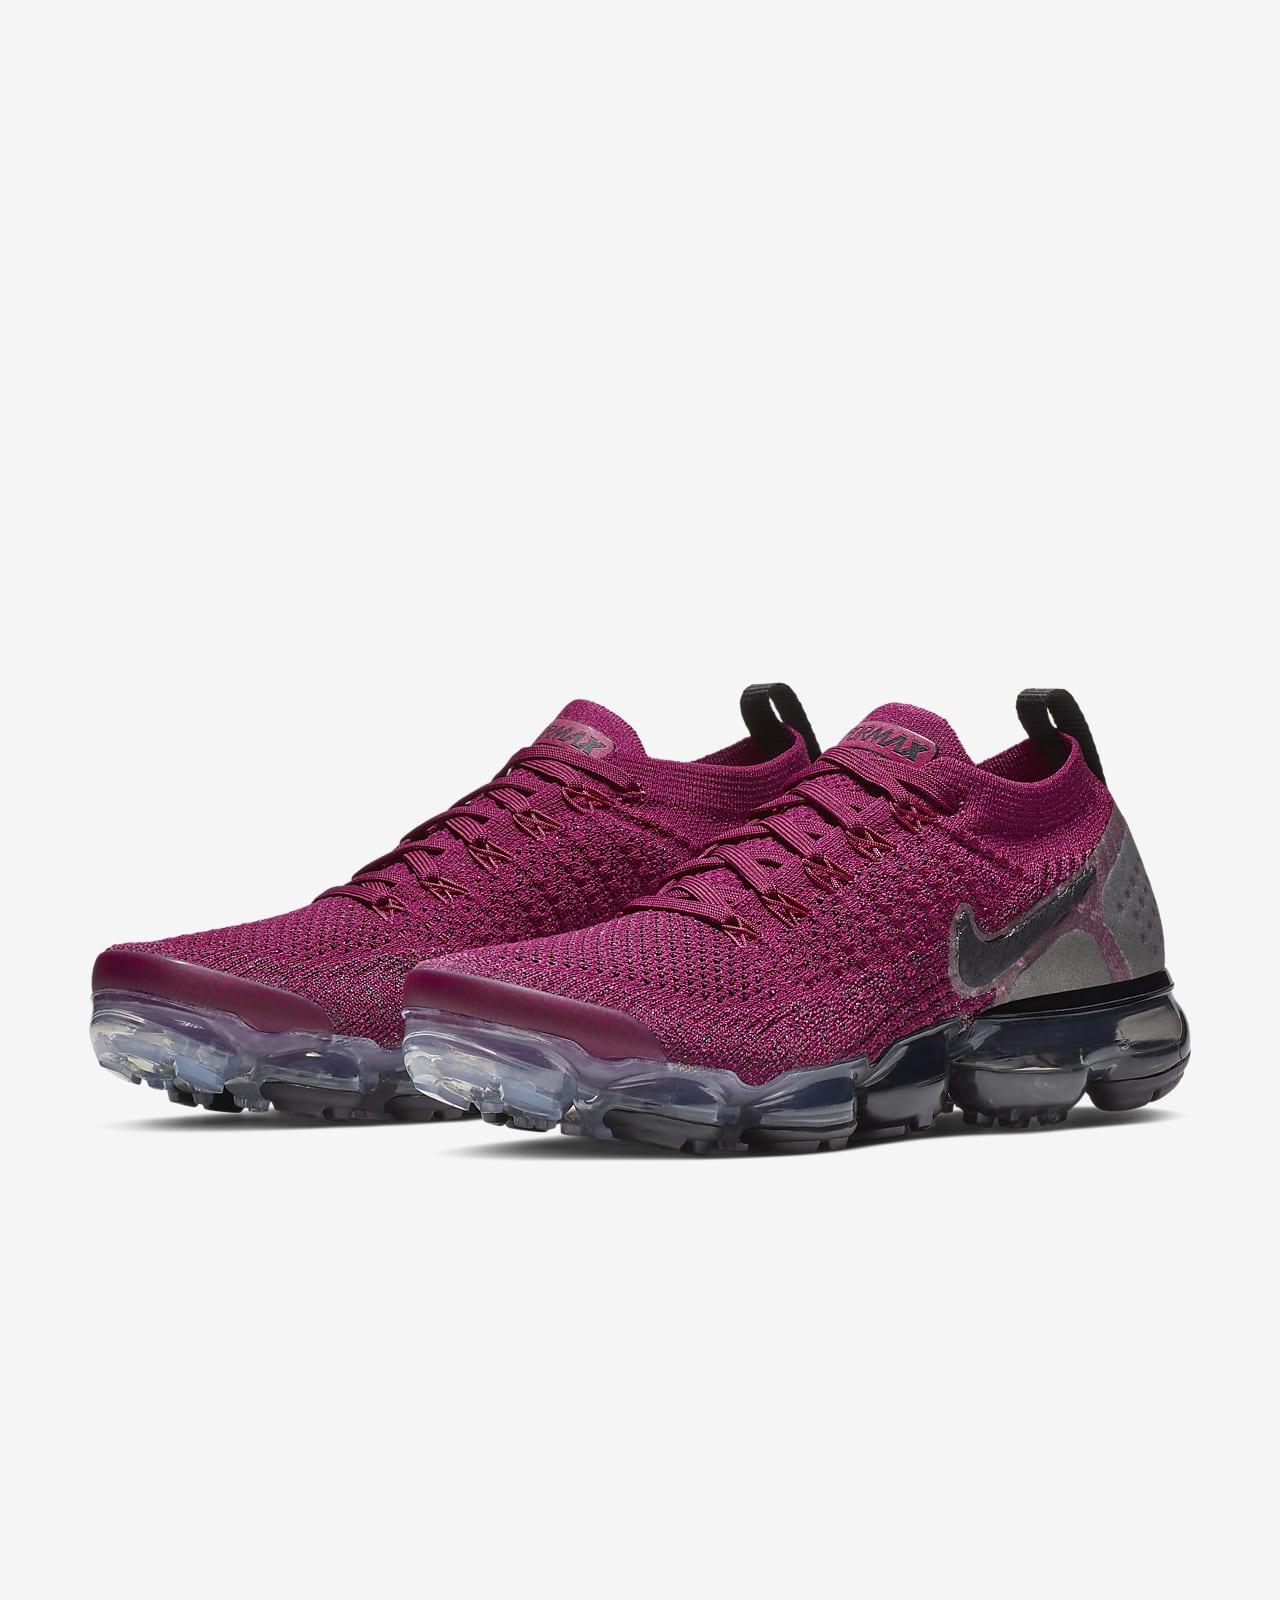 Nike Air Vapormax 2019 Pink White Womens Size 7 Tennis Running Shoes Pink Rise